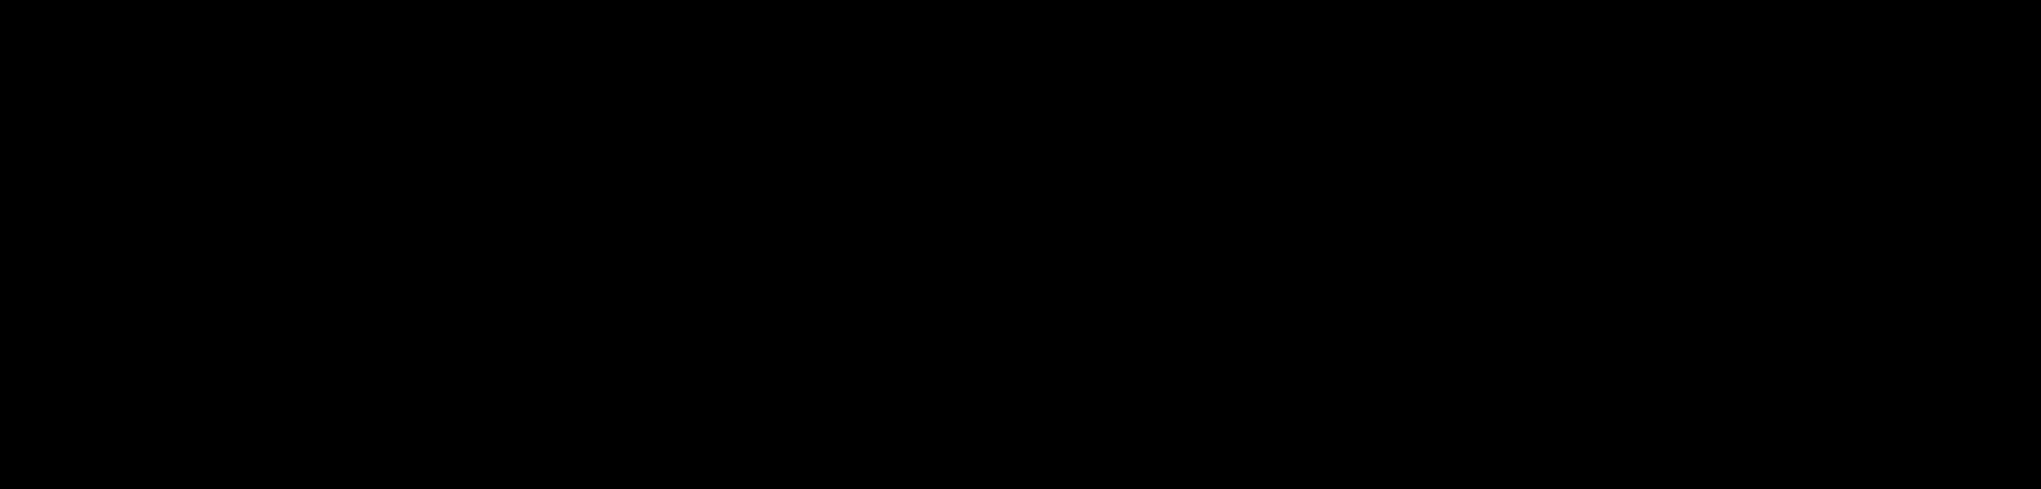 Kelli Oakes logo